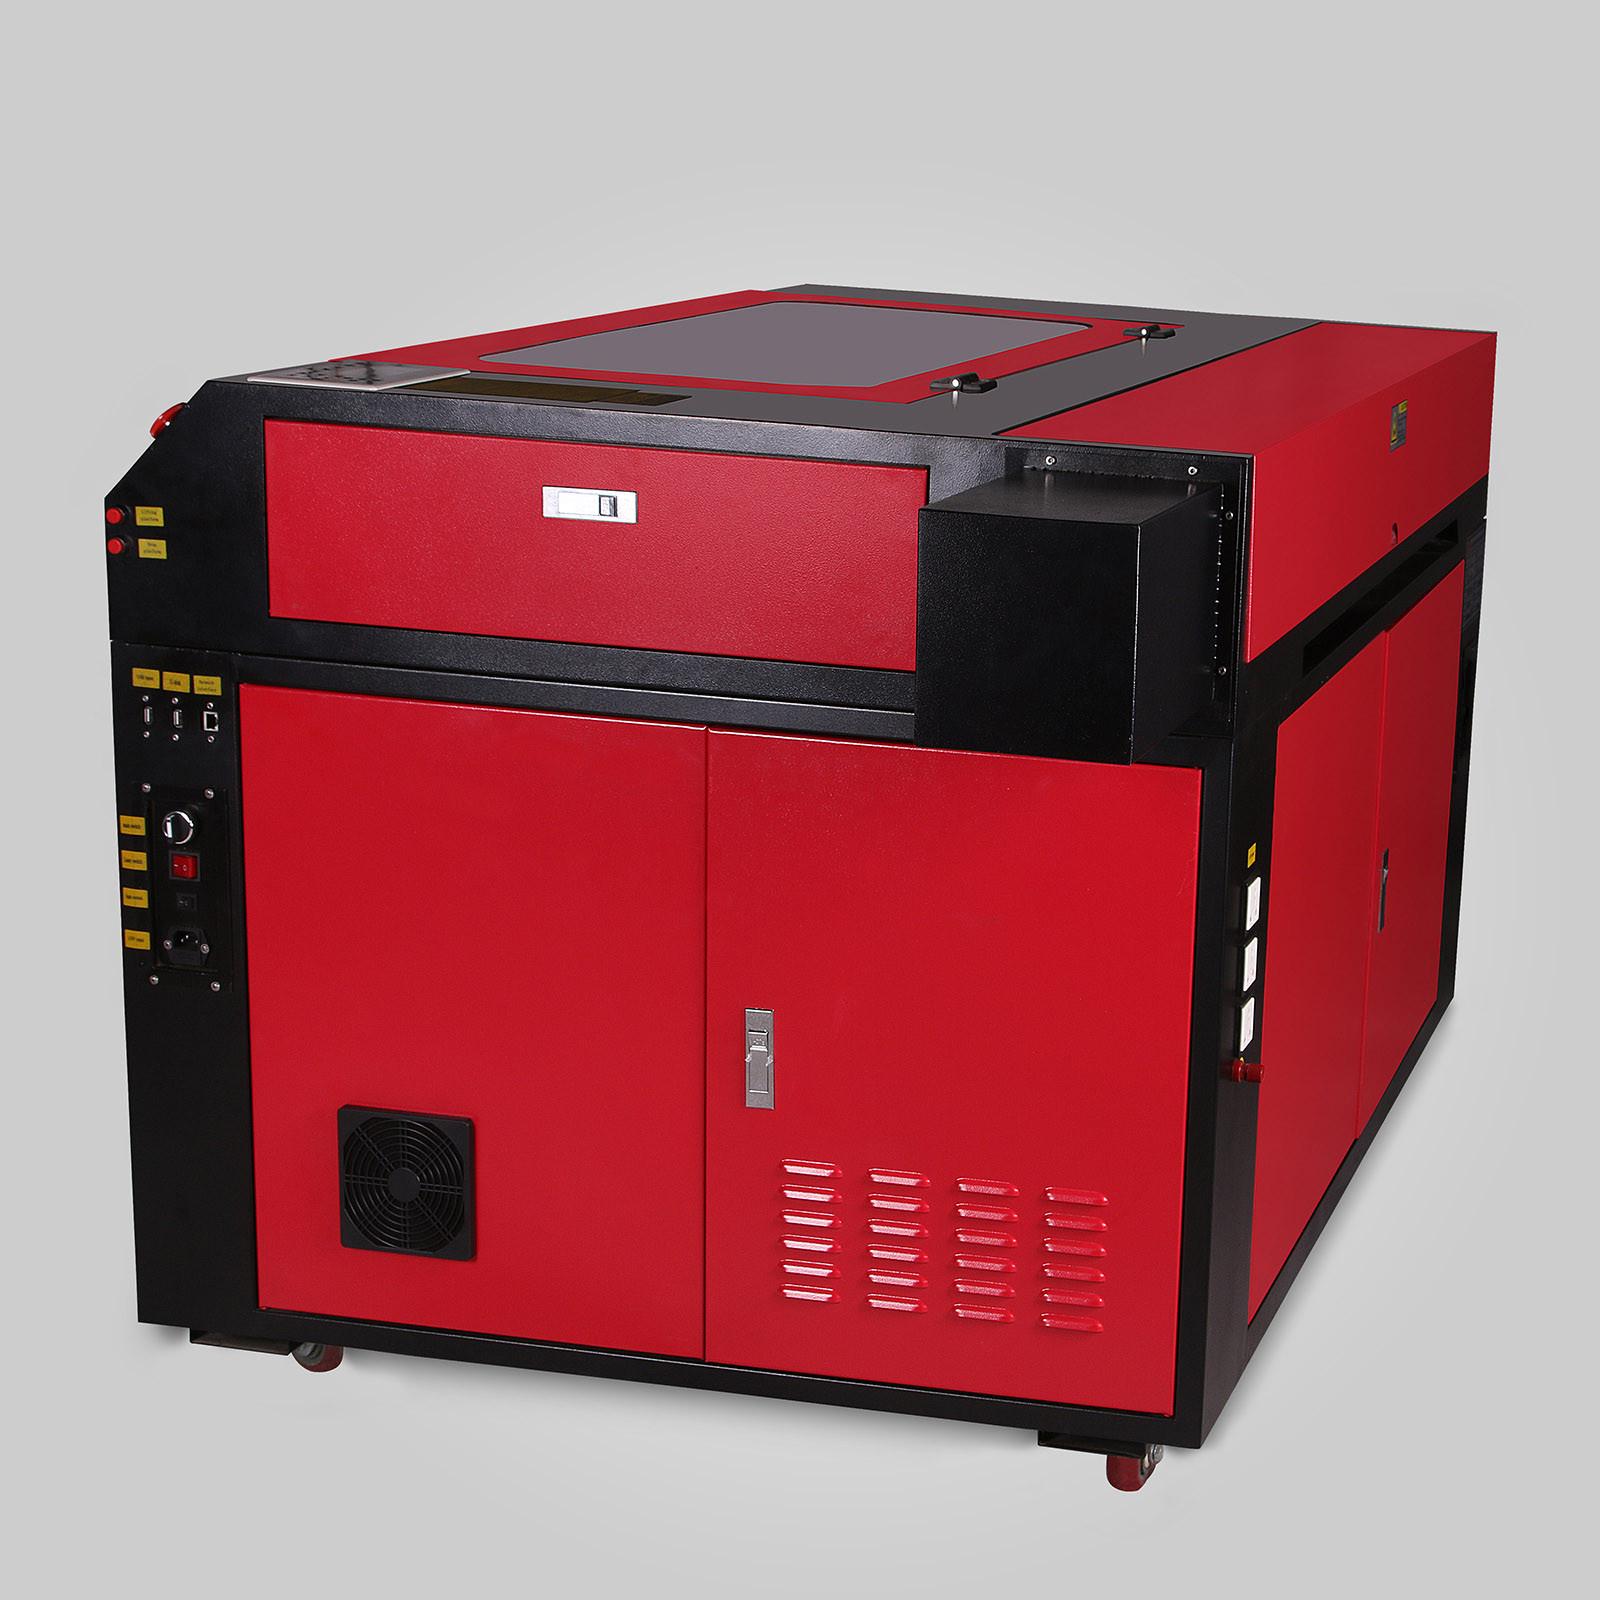 Macchina-per-Incisione-Laser-CO2-40-130W-Asse-Rotante-Tagliatrice-Incisore miniatura 63